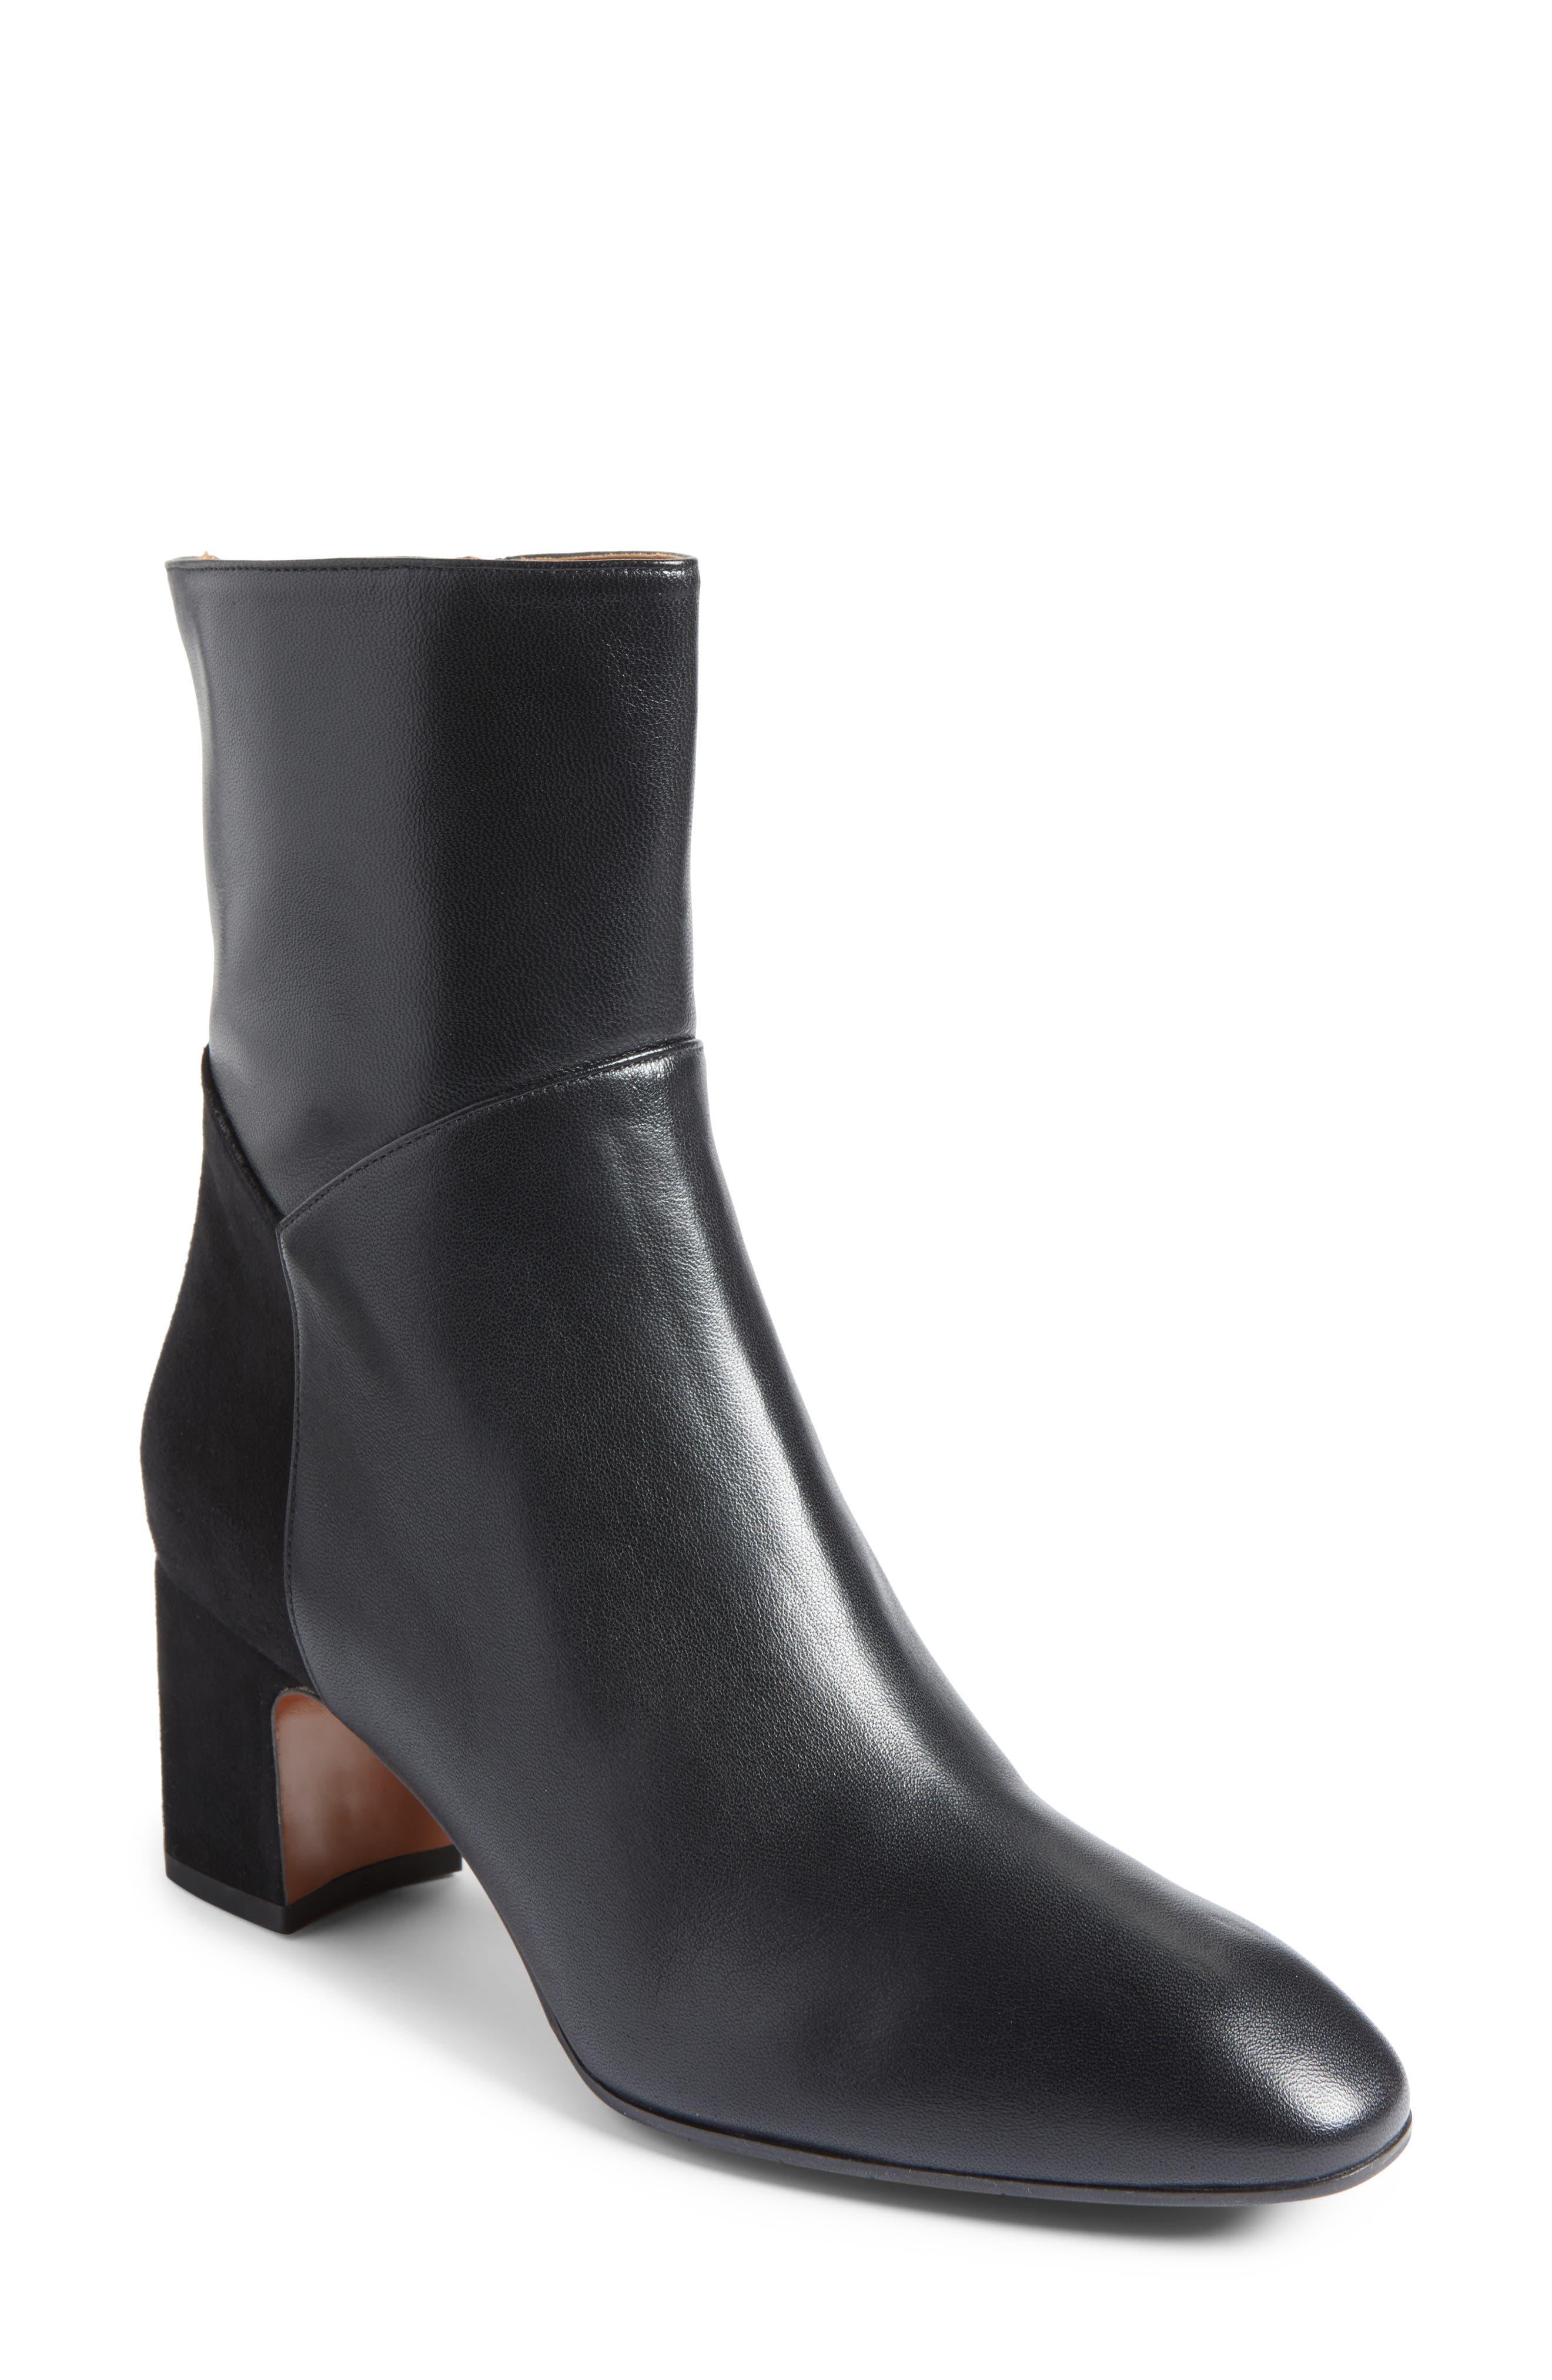 Alternate Image 1 Selected - Aquatalia Elodie Weatherproof Boot (Women)